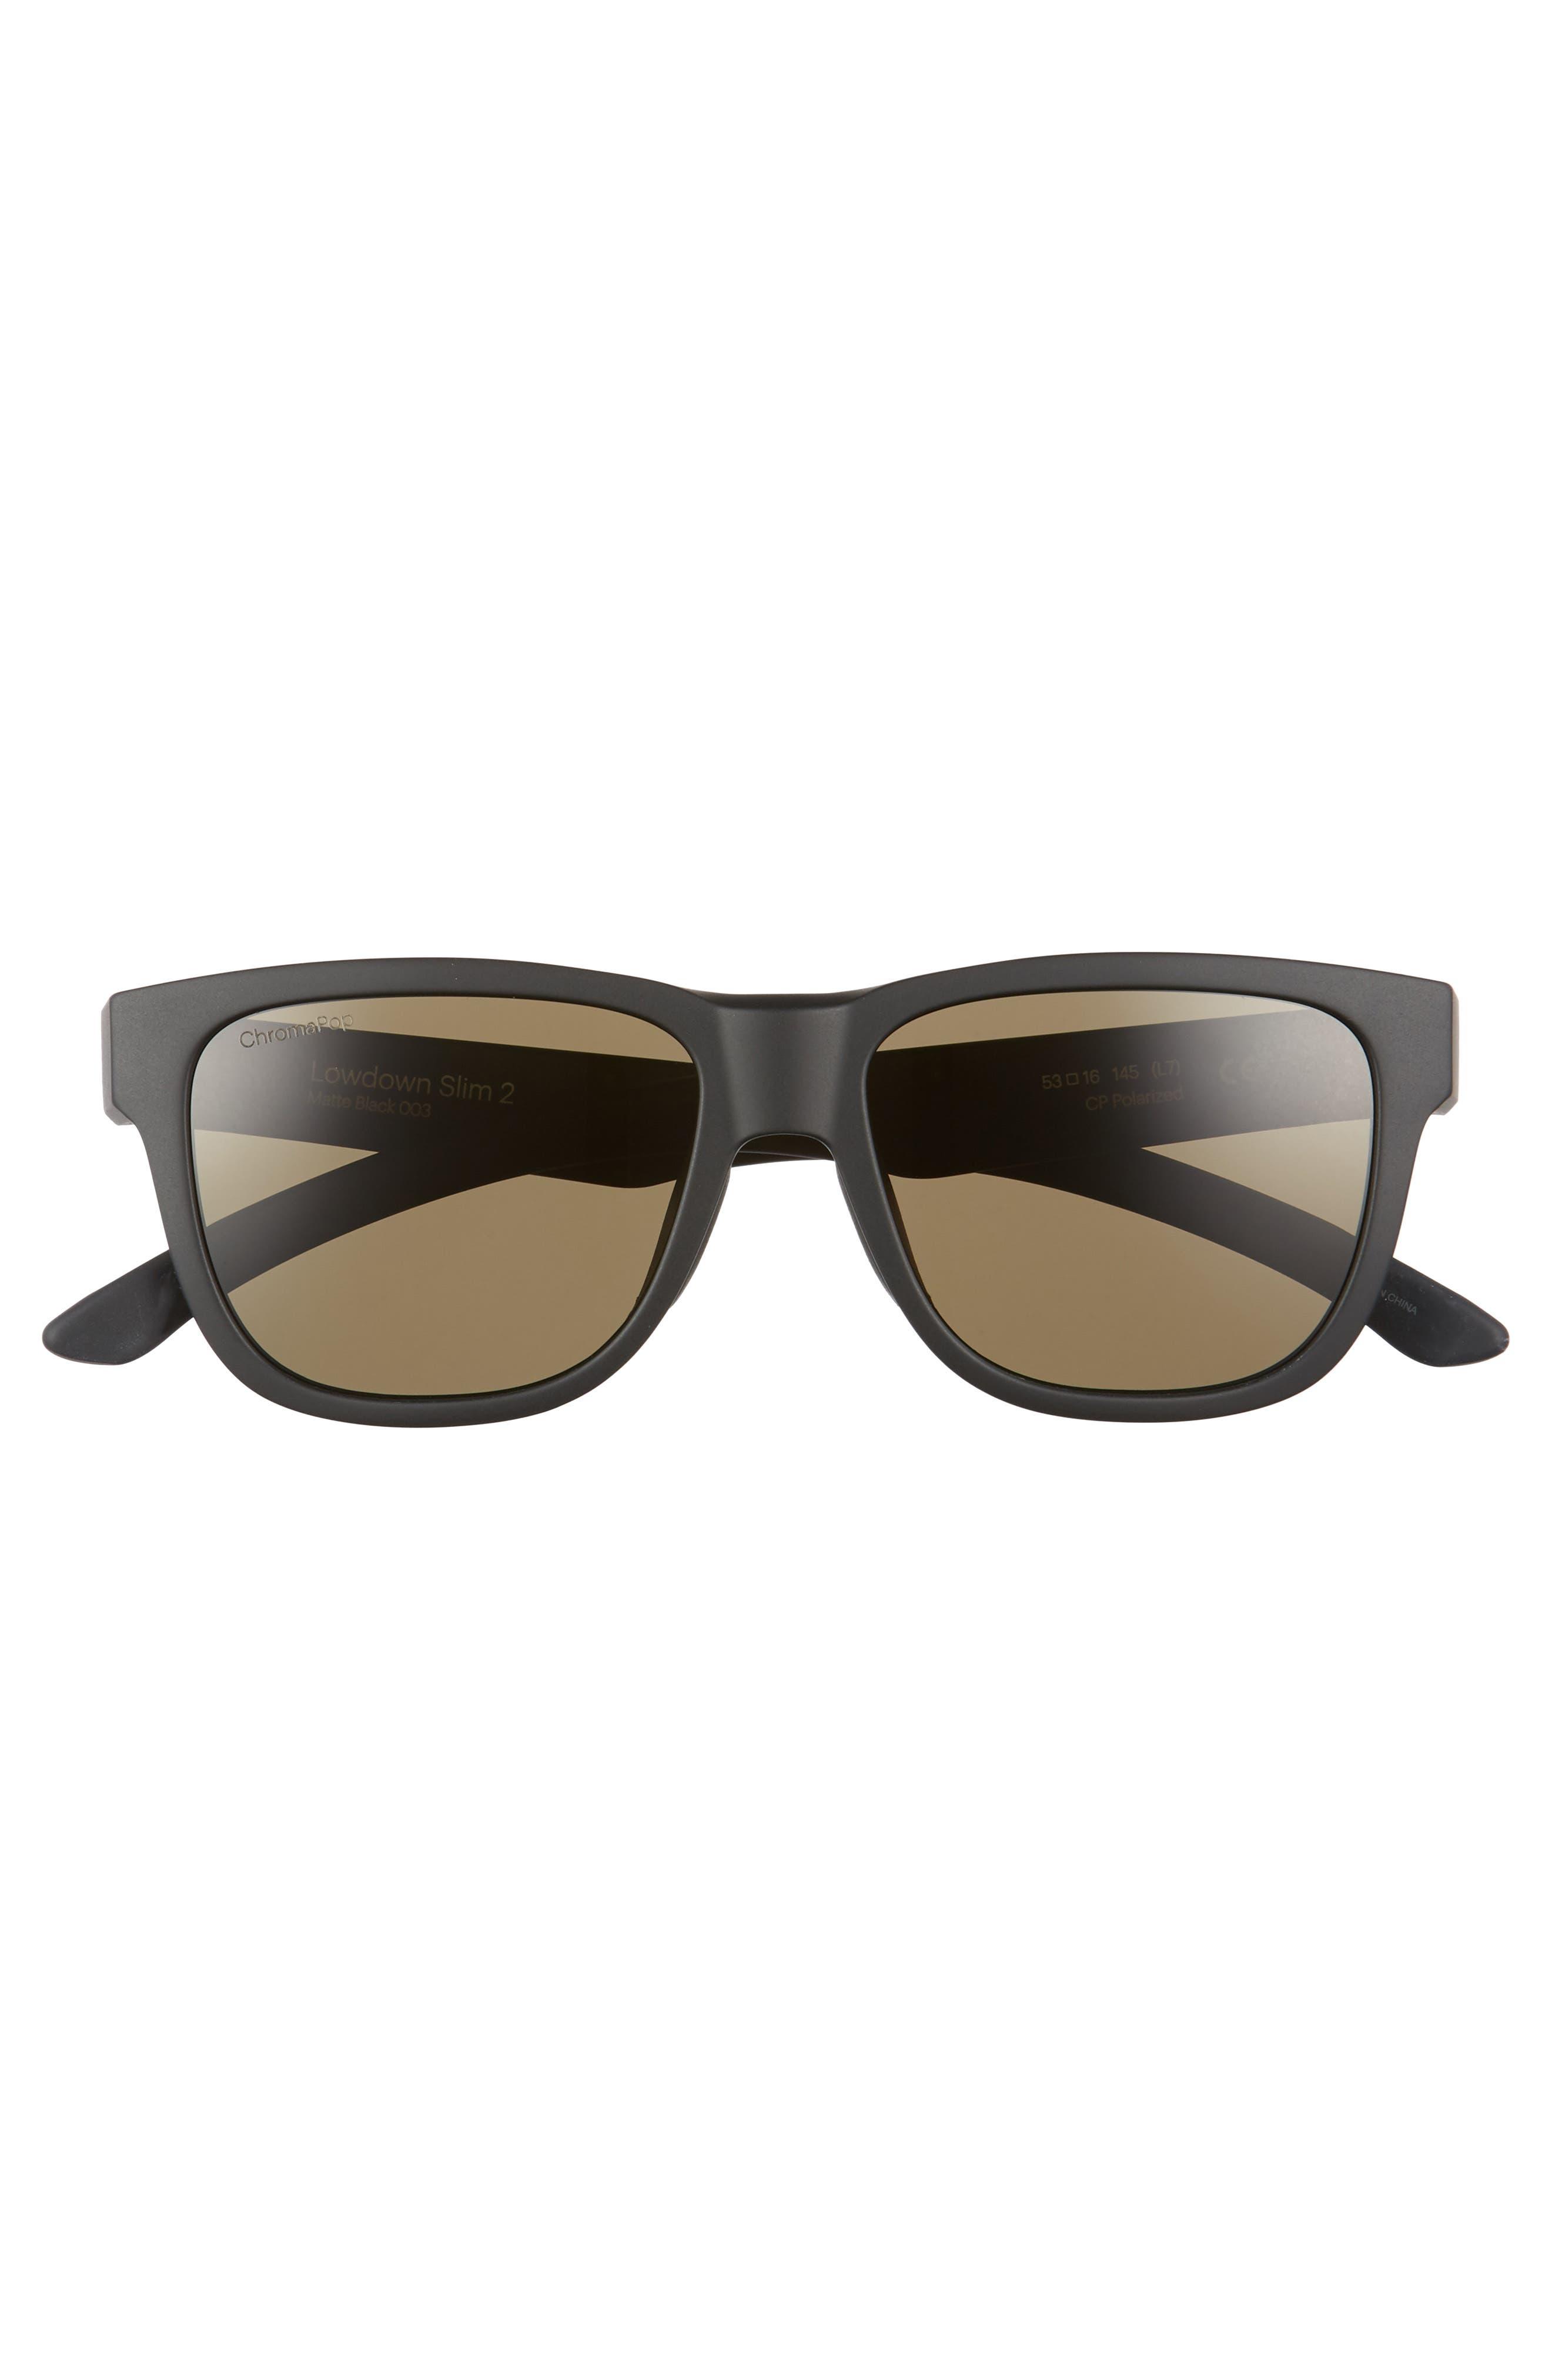 Lowdown Slim 2 53mm ChromaPop<sup>™</sup> Square Sunglasses,                             Alternate thumbnail 3, color,                             MATTE BLACK